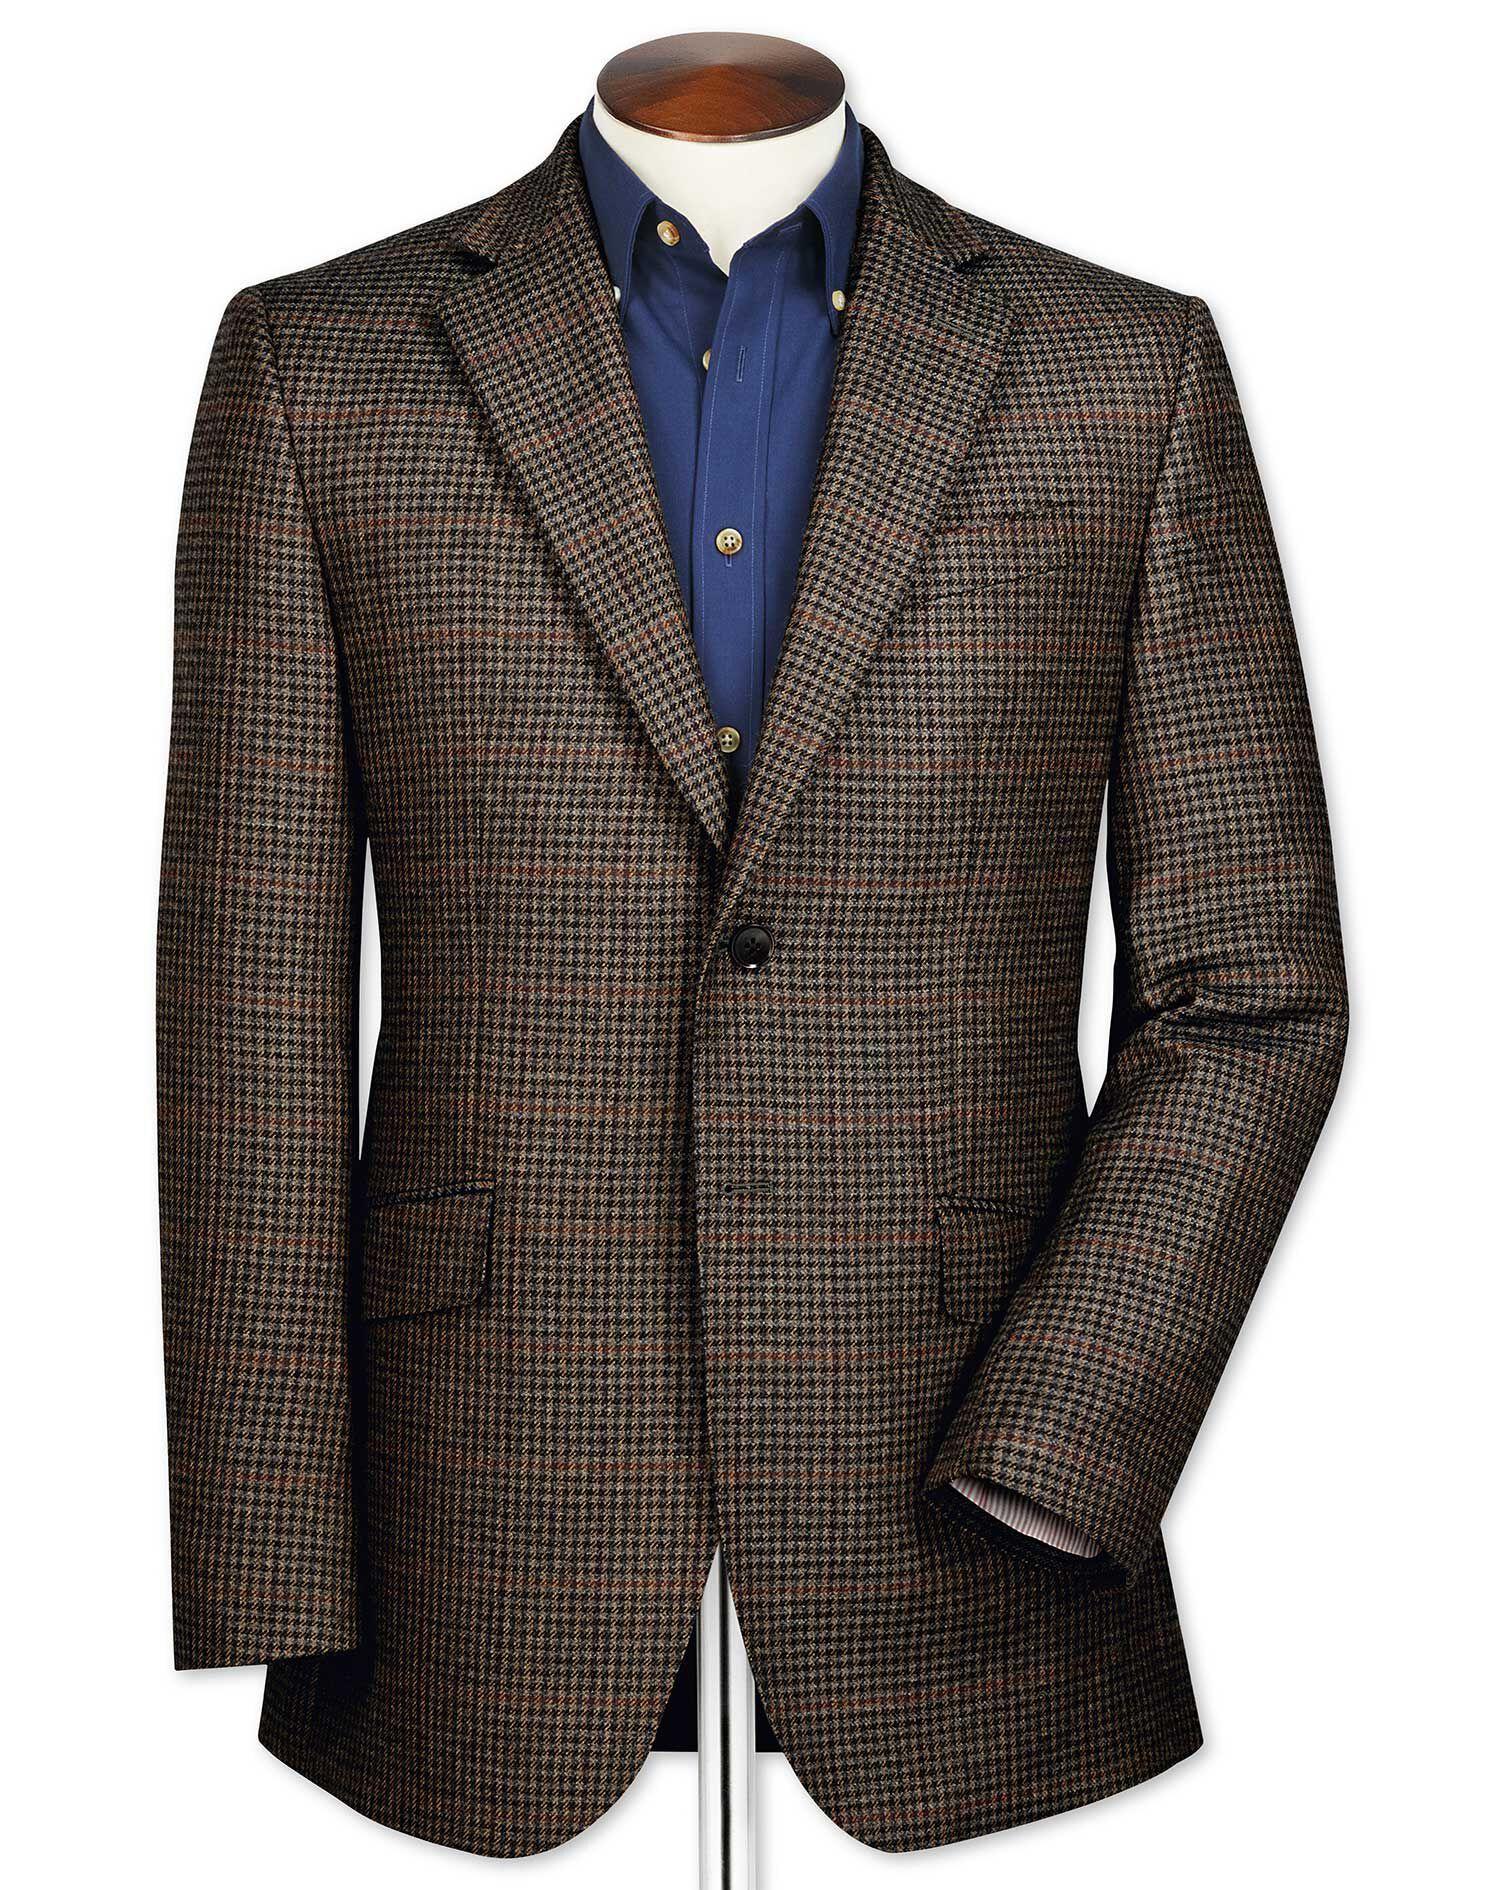 Classic Fit Brown Semi-Plain Lambswool Wool Jacket Size 46 Regular by Charles Tyrwhitt